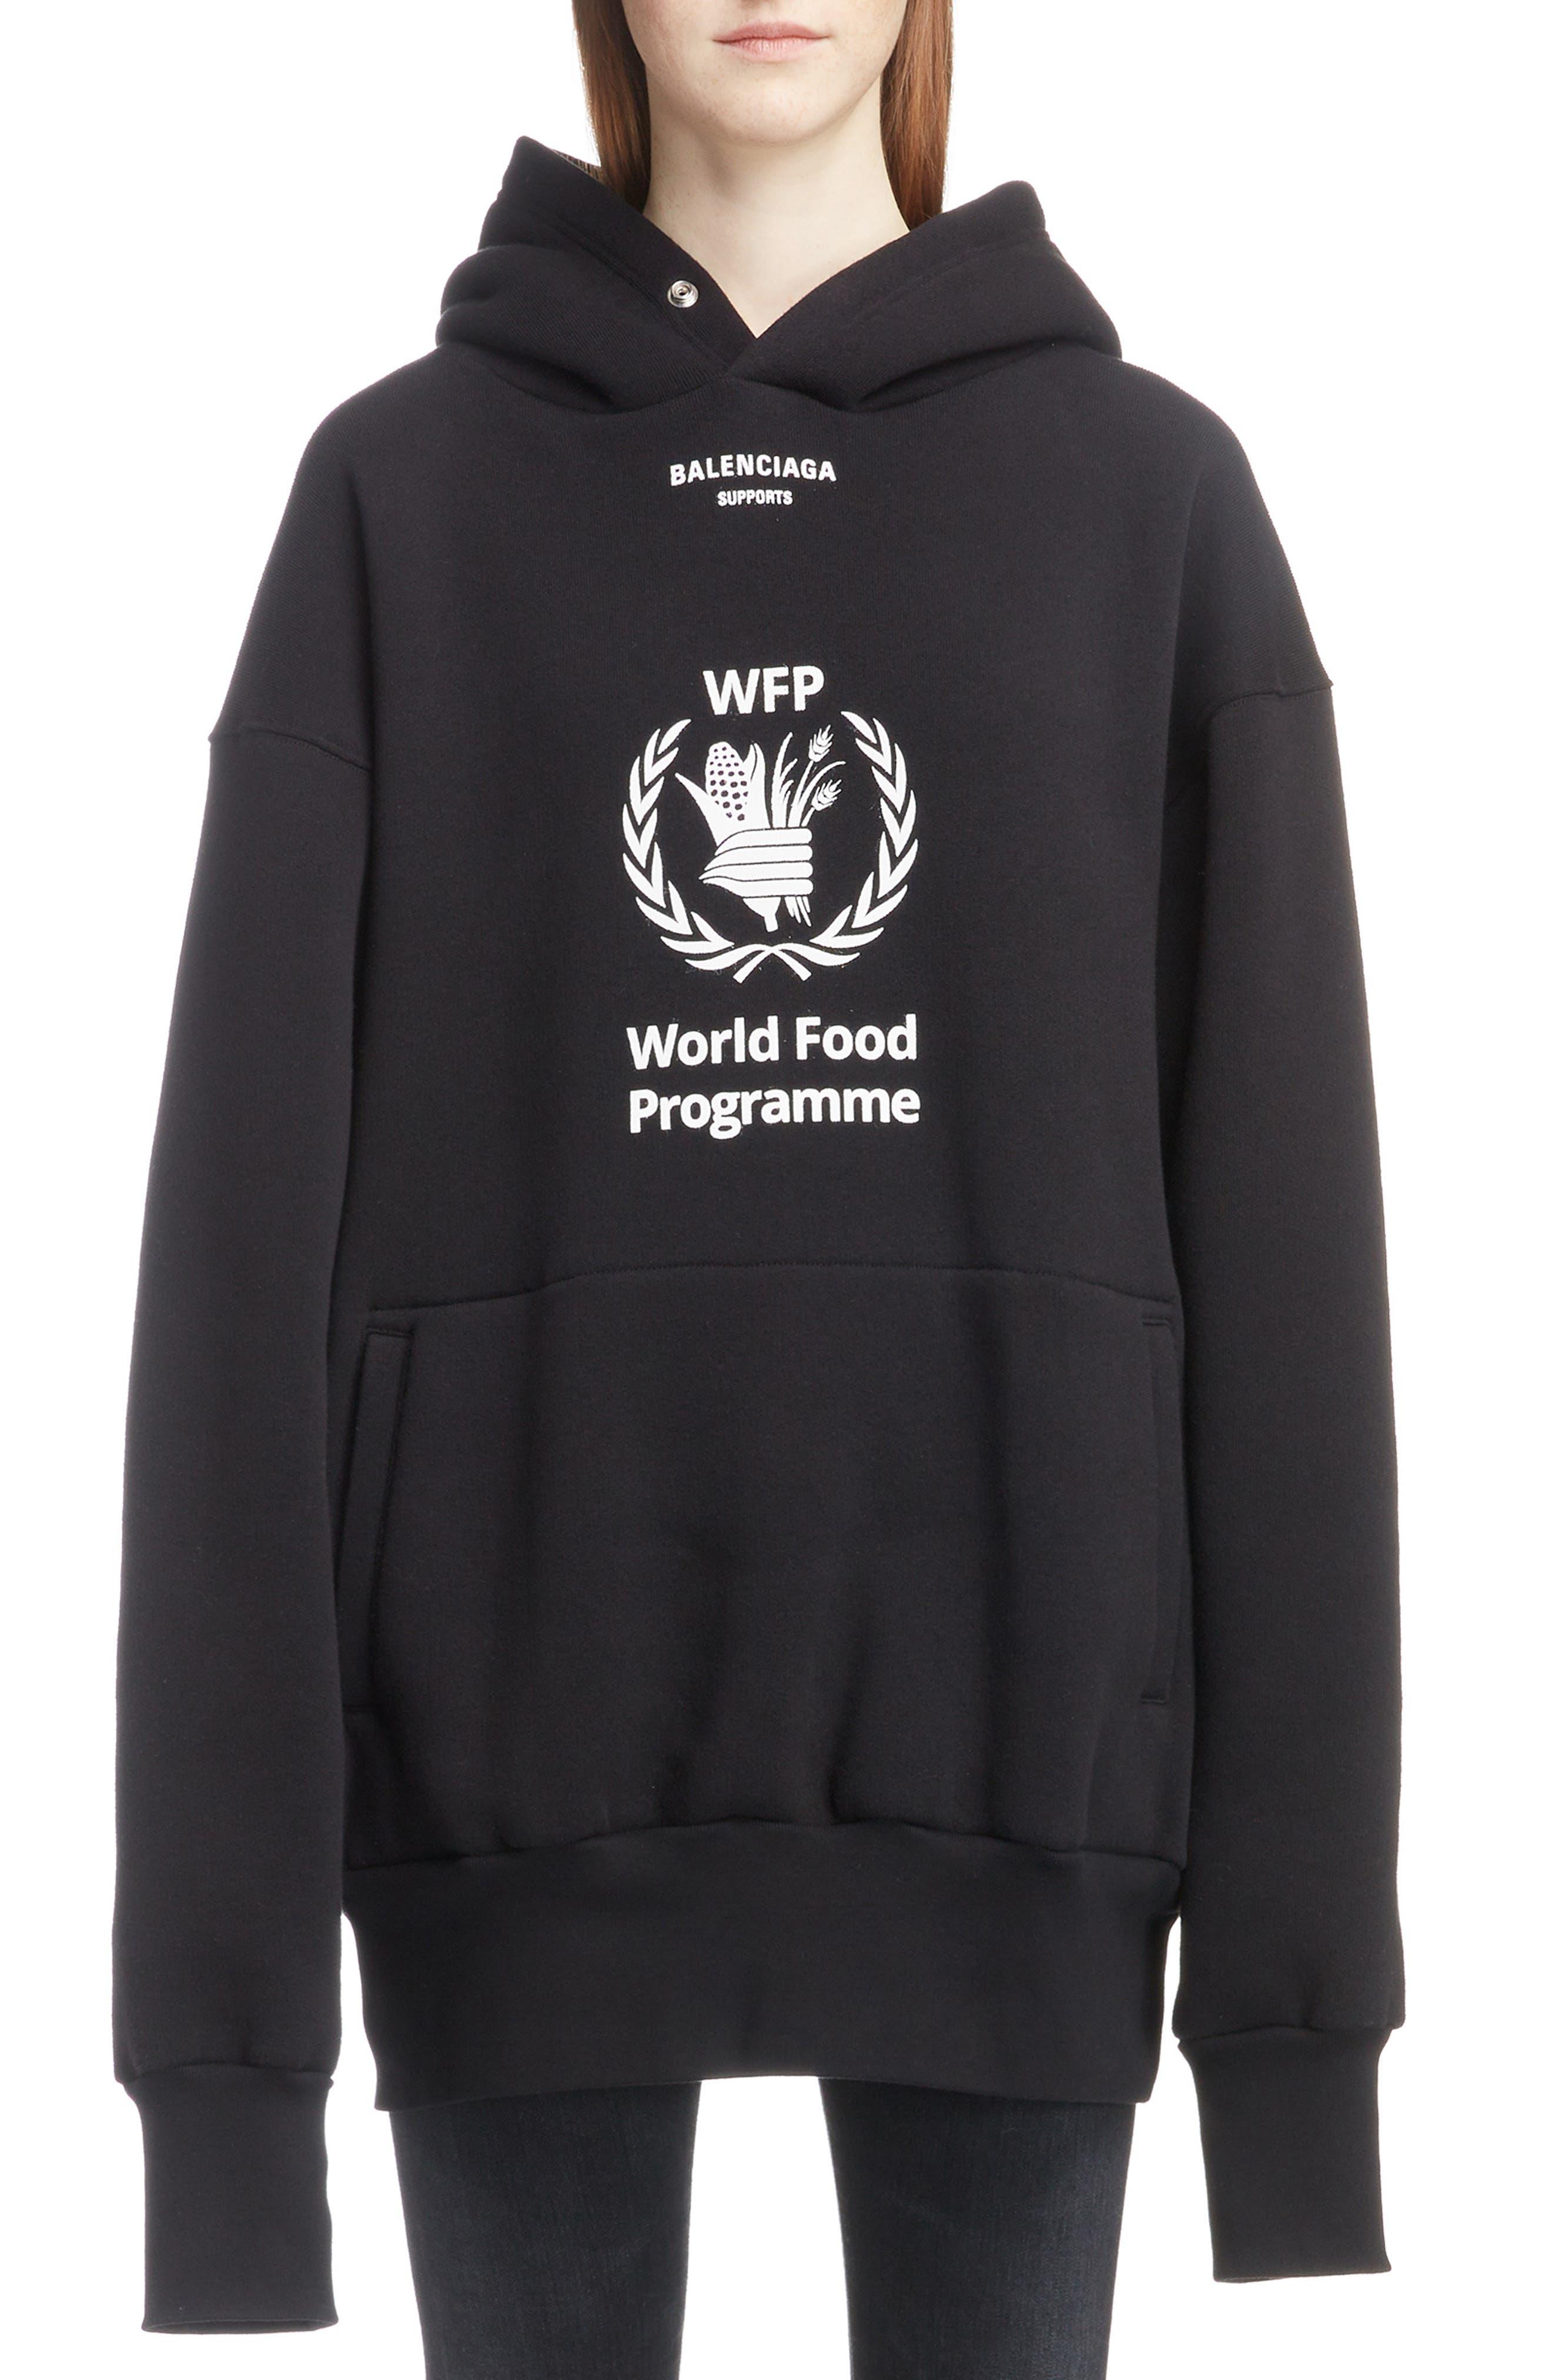 World Food Programme Oversize Brushed Felt Hoodie,                             Main thumbnail 1, color,                             1070-BLACK/ WHITE